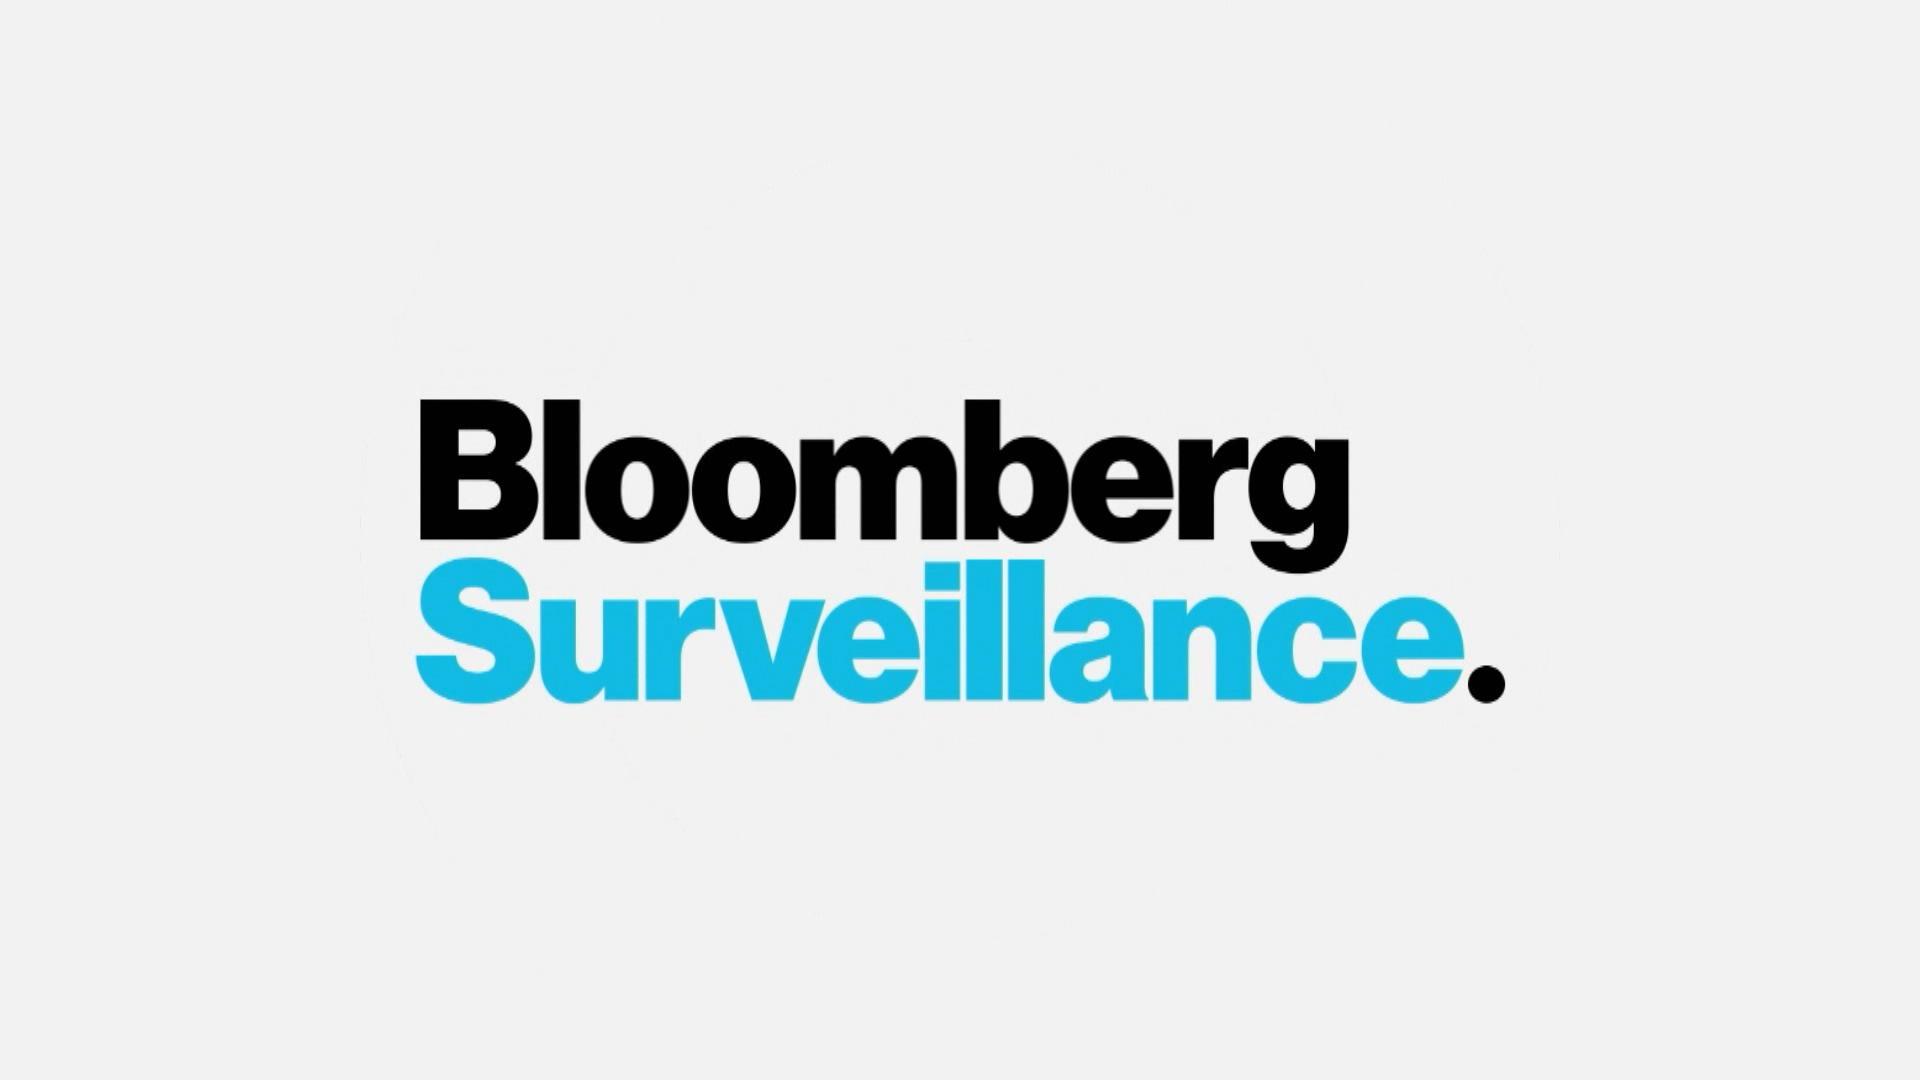 Bloomberg Surveillance' 09/09/2019 - Bloomberg